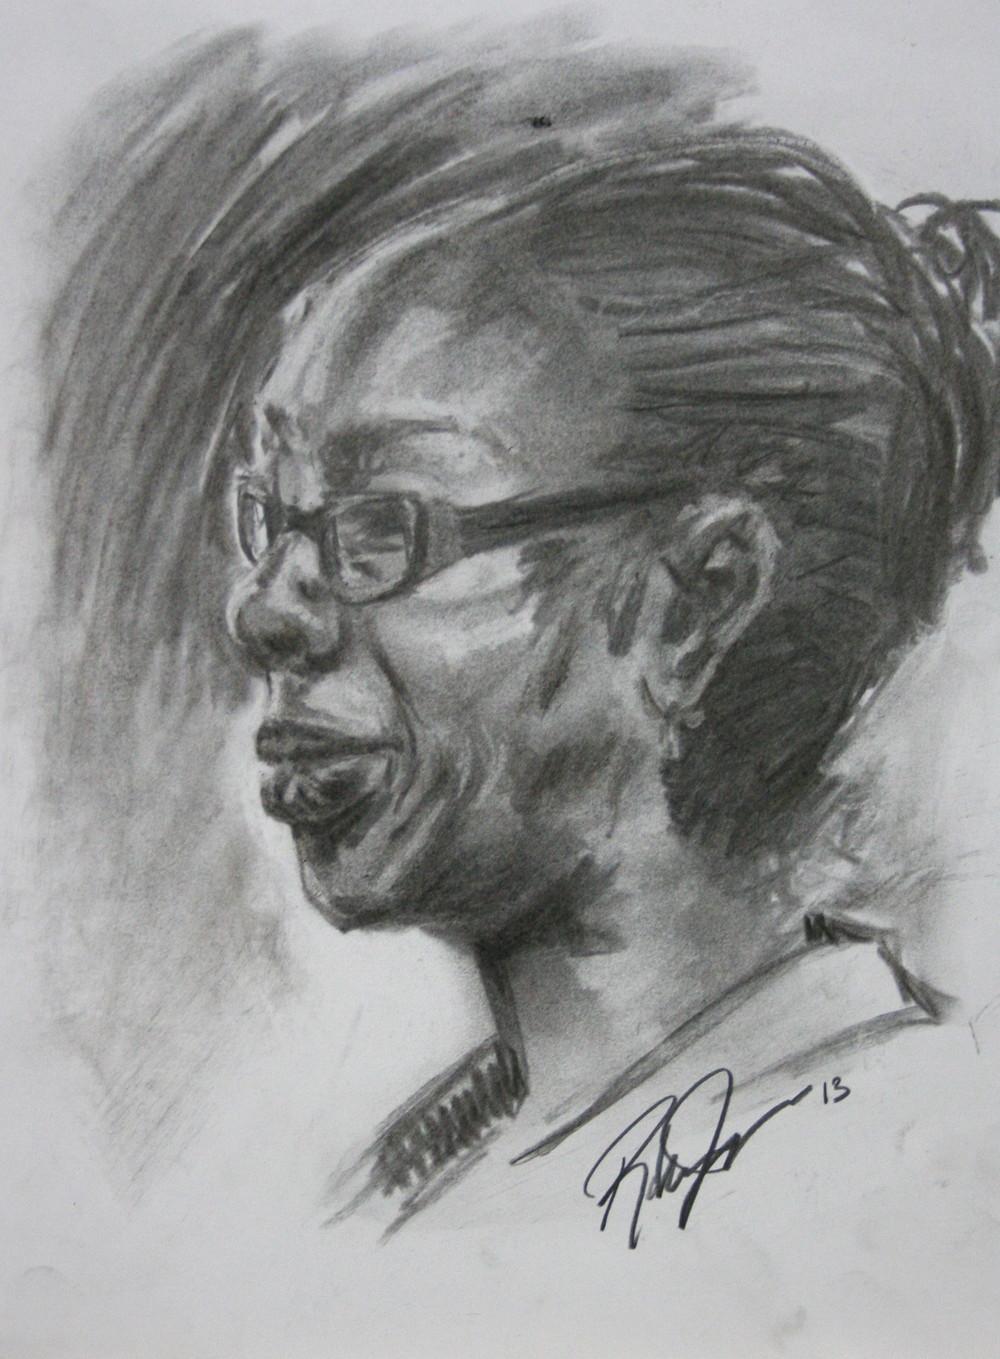 Melody Moss by Rahni Jackson 7-19-13